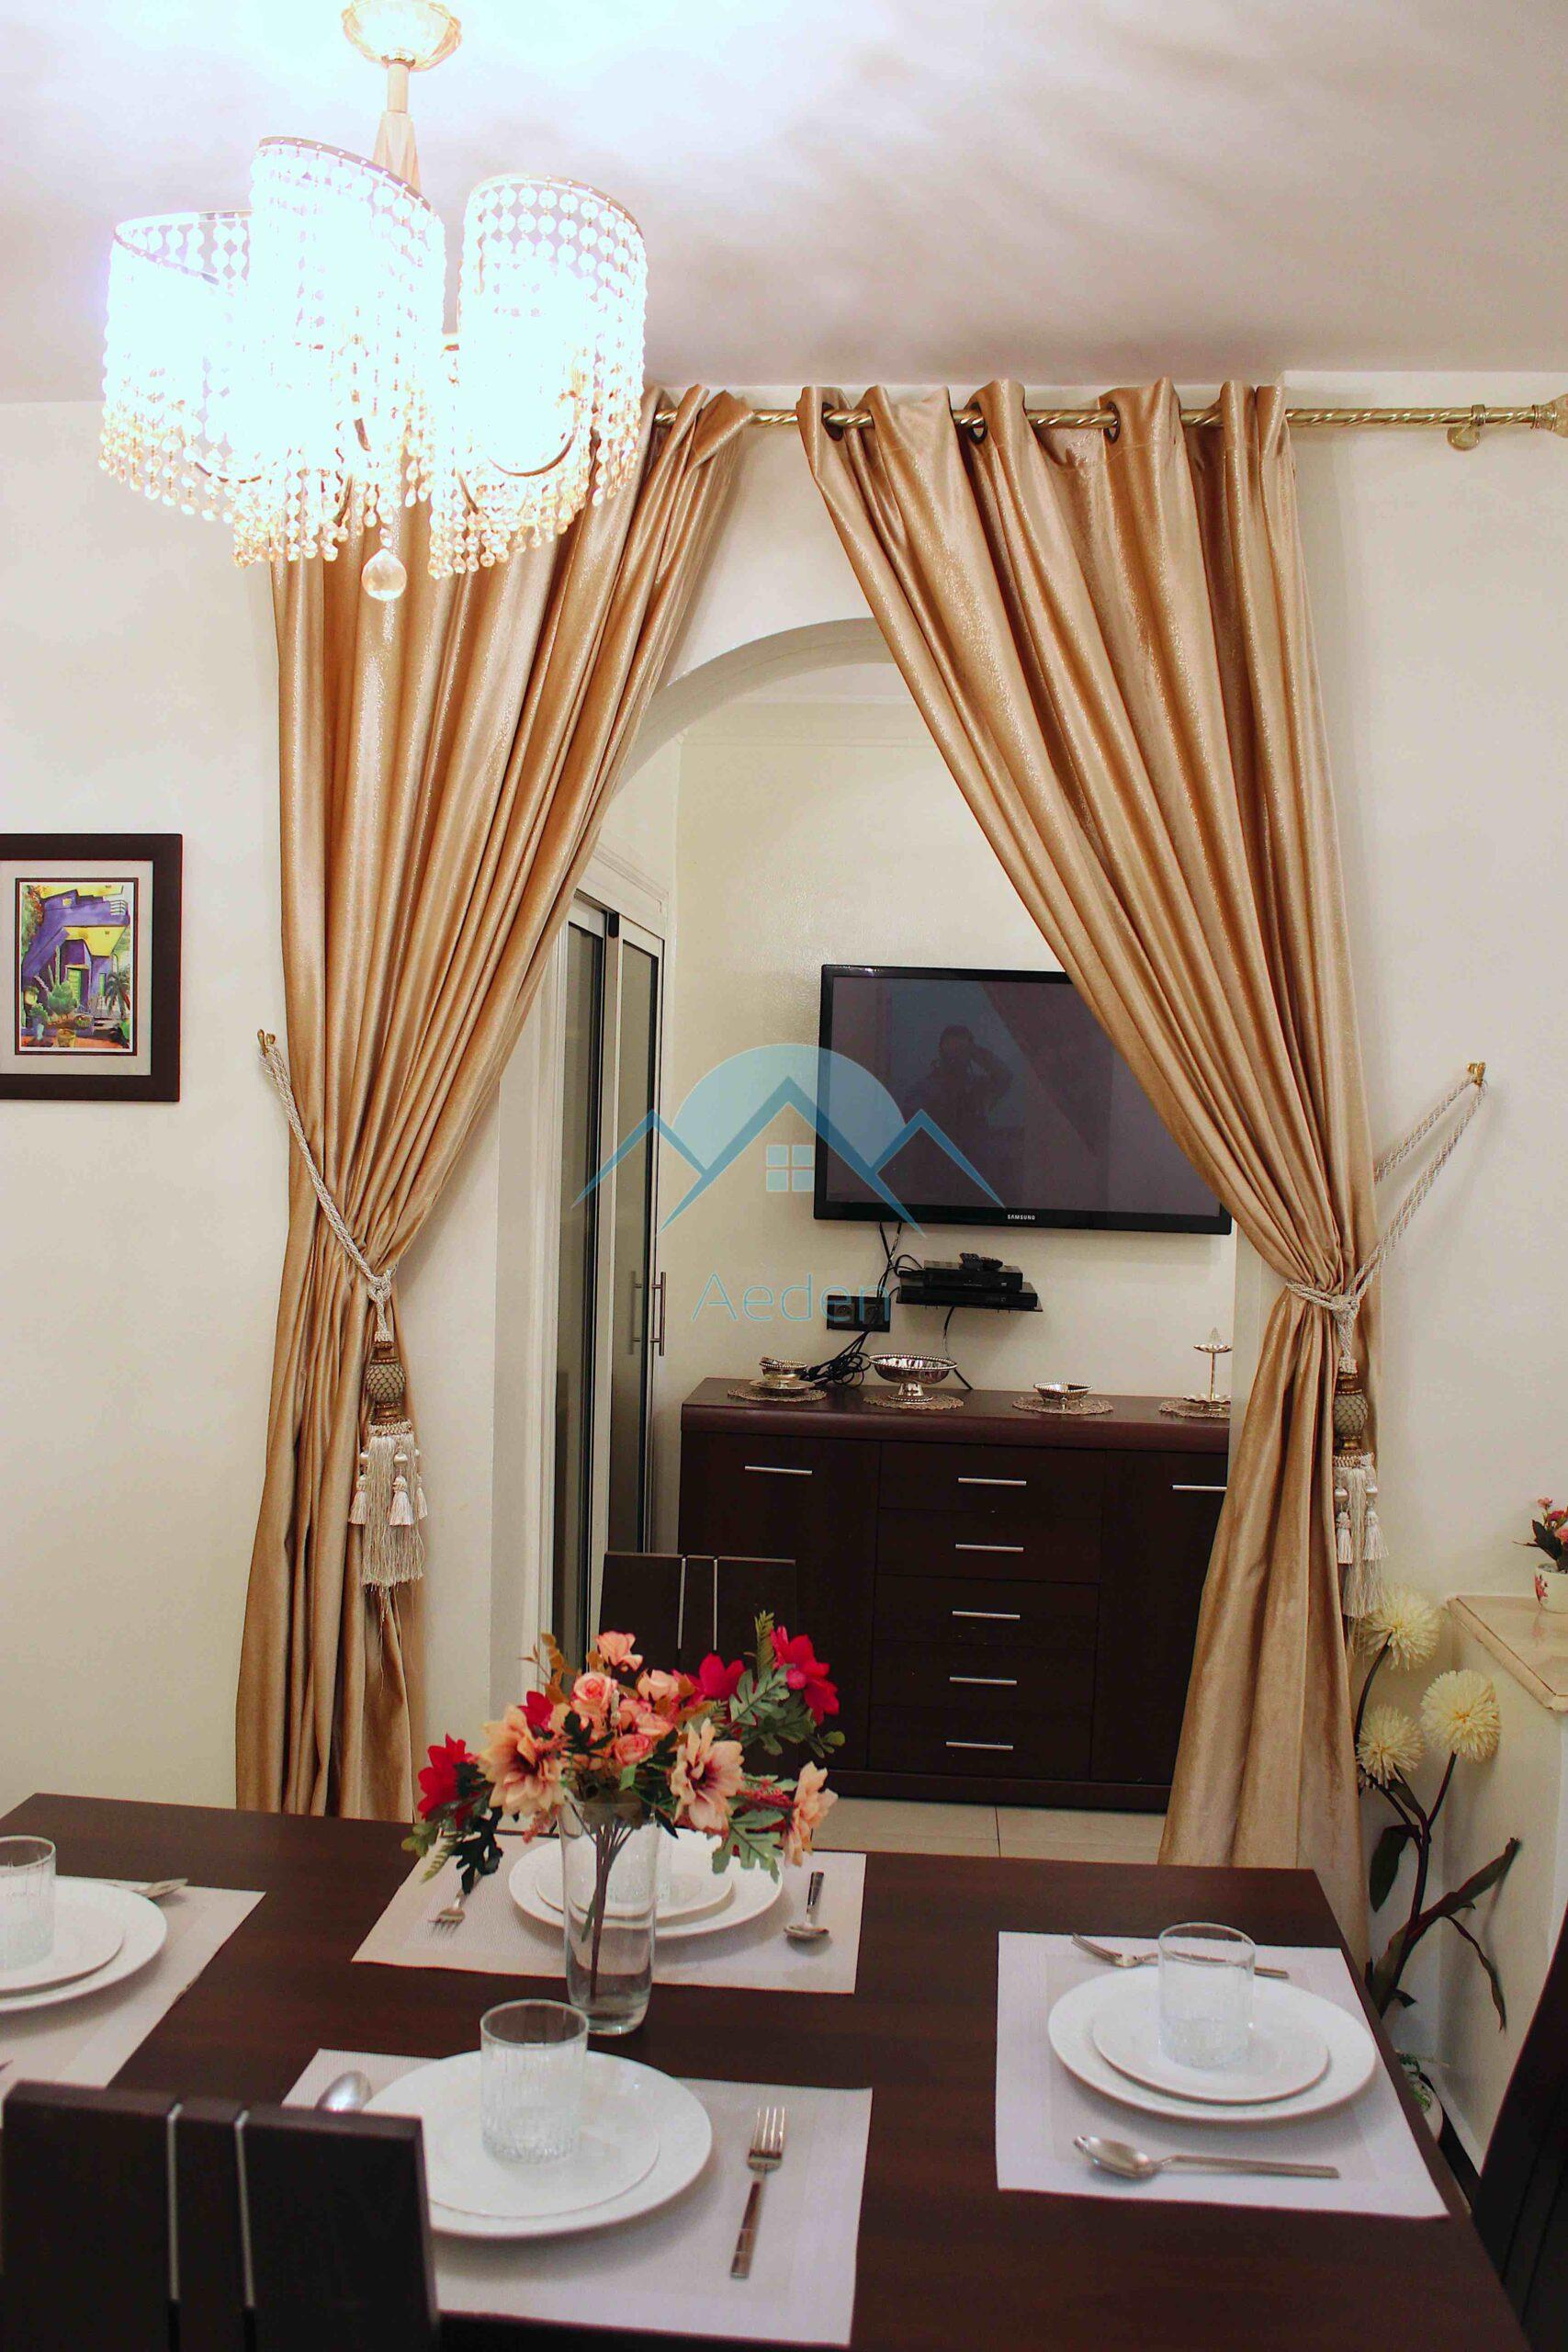 Appartement à vendre Gueliz – شقة للبيع